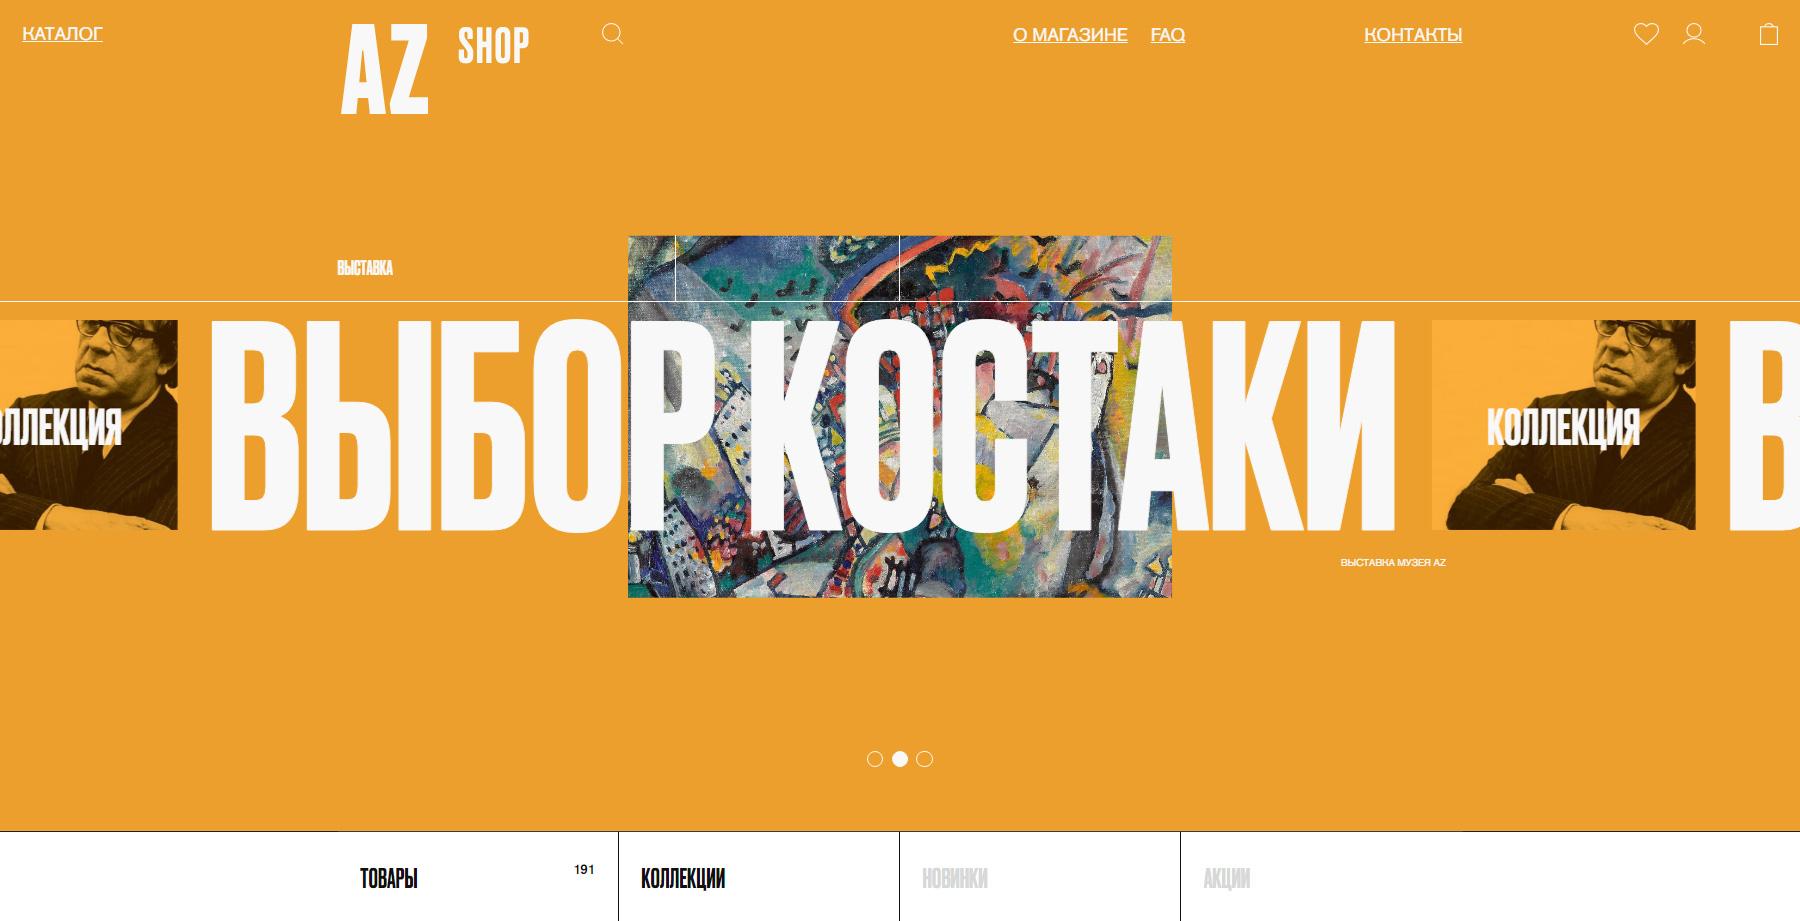 AZ Museum Shop - Website of the Day